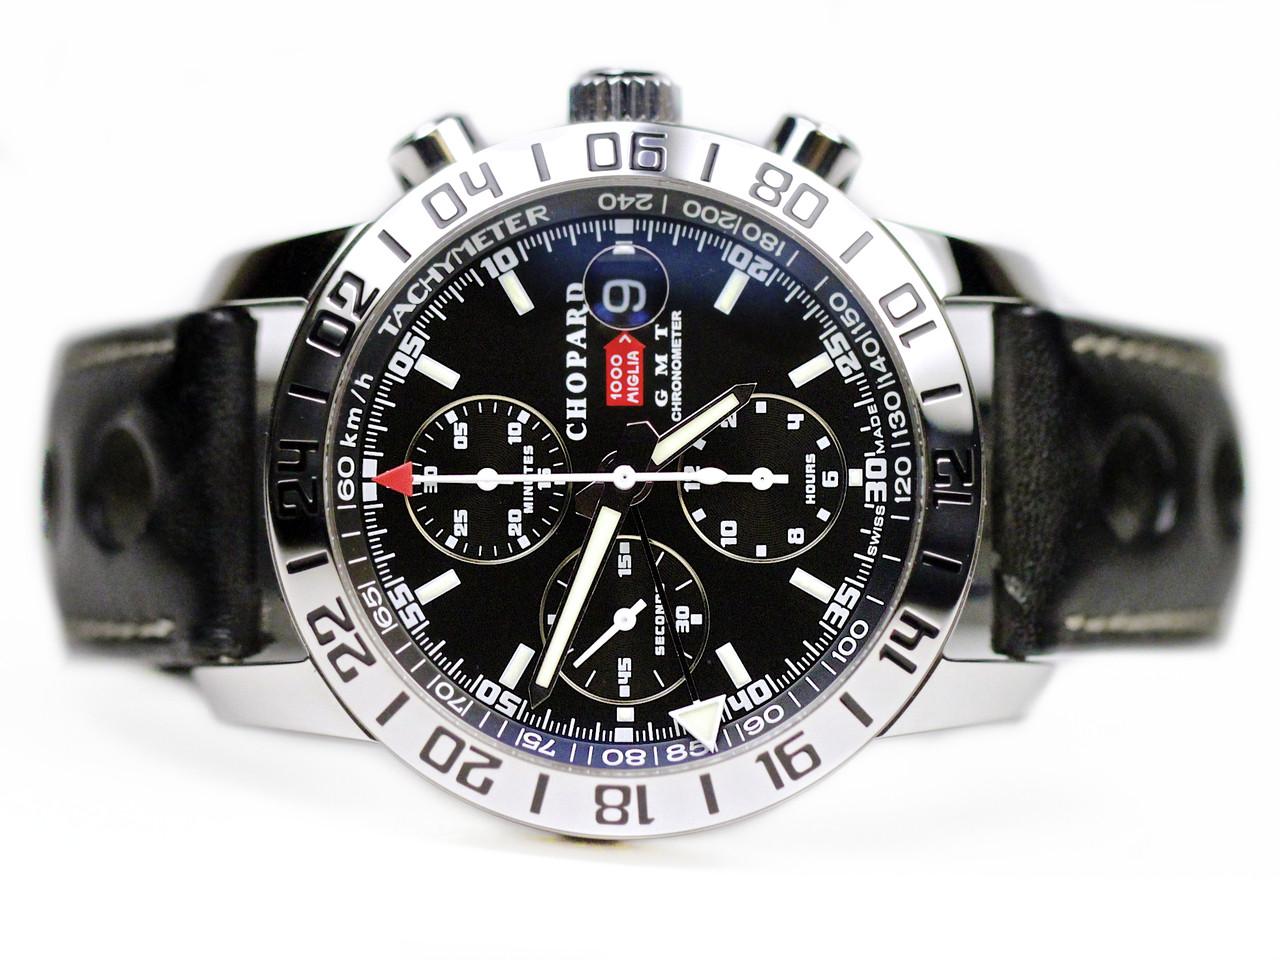 1e96e185b82cd Chopard Watch - Mille Miglia GMT Chrono 168992 -- www.legendoftime.com